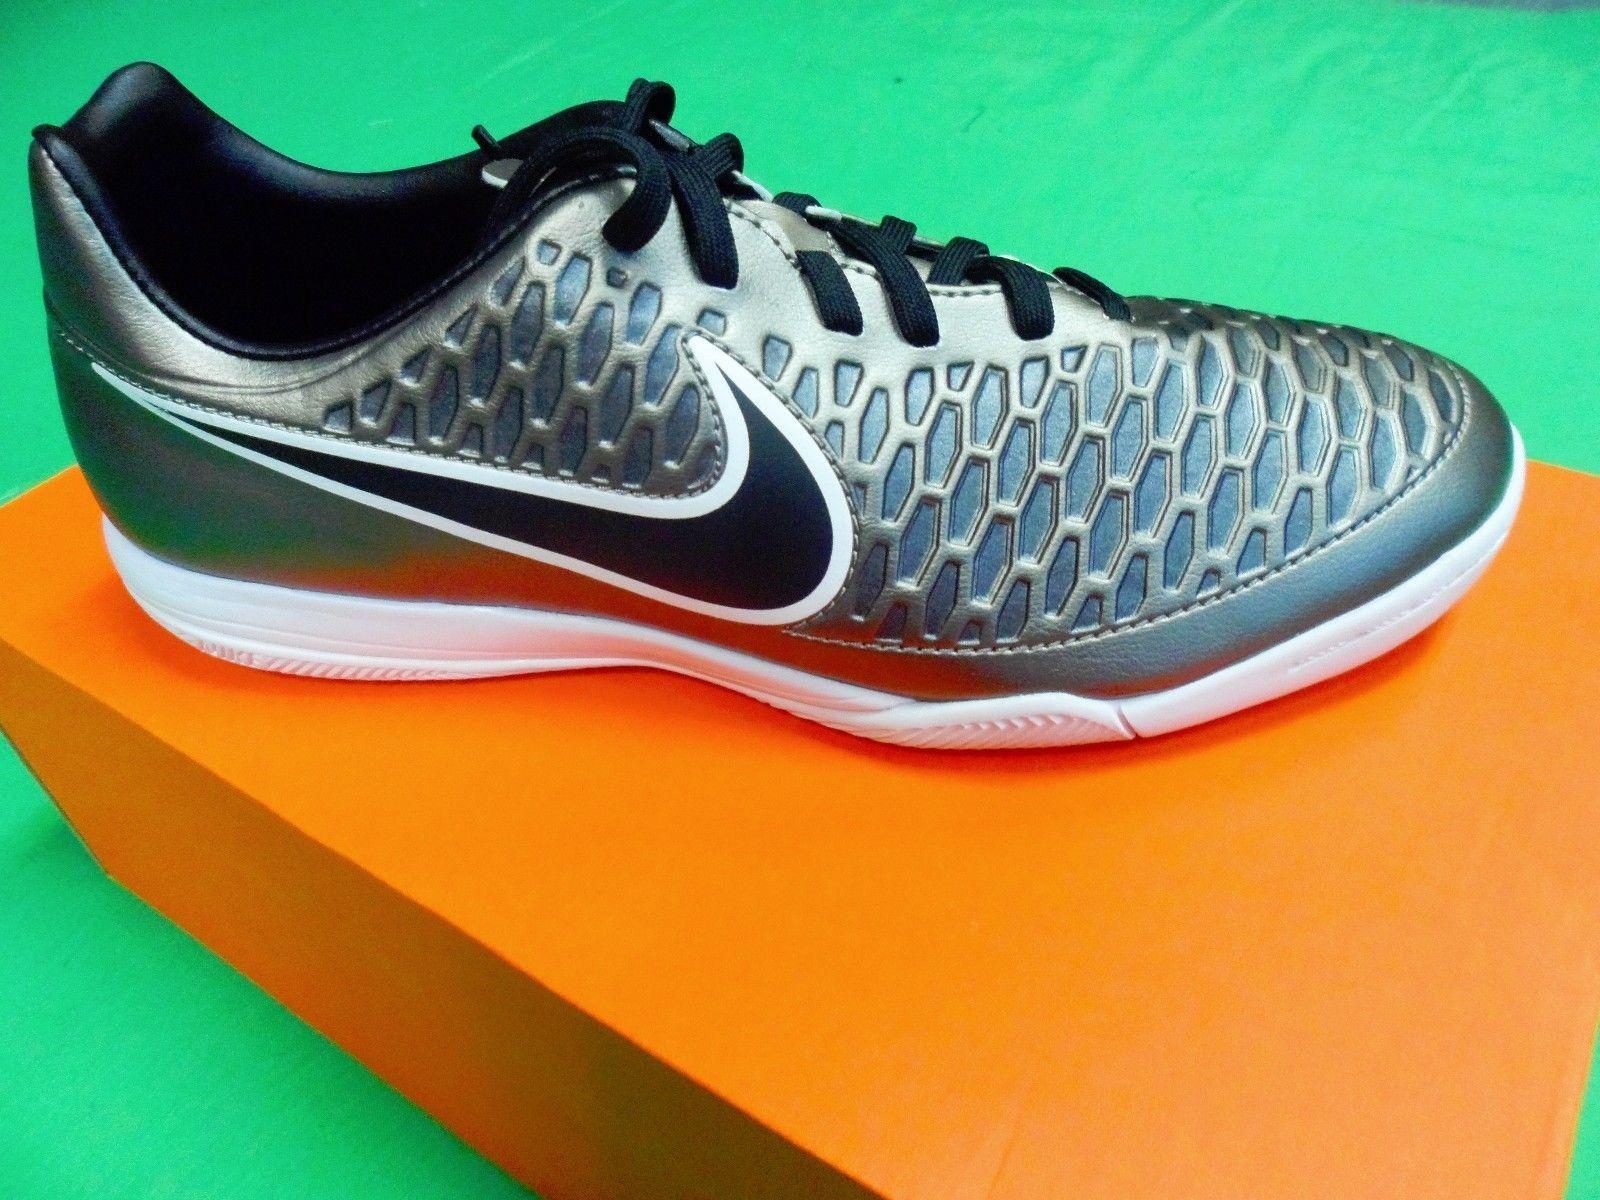 844595 801 Nike Magista Obra II FG Laser Orange Euro Petrol